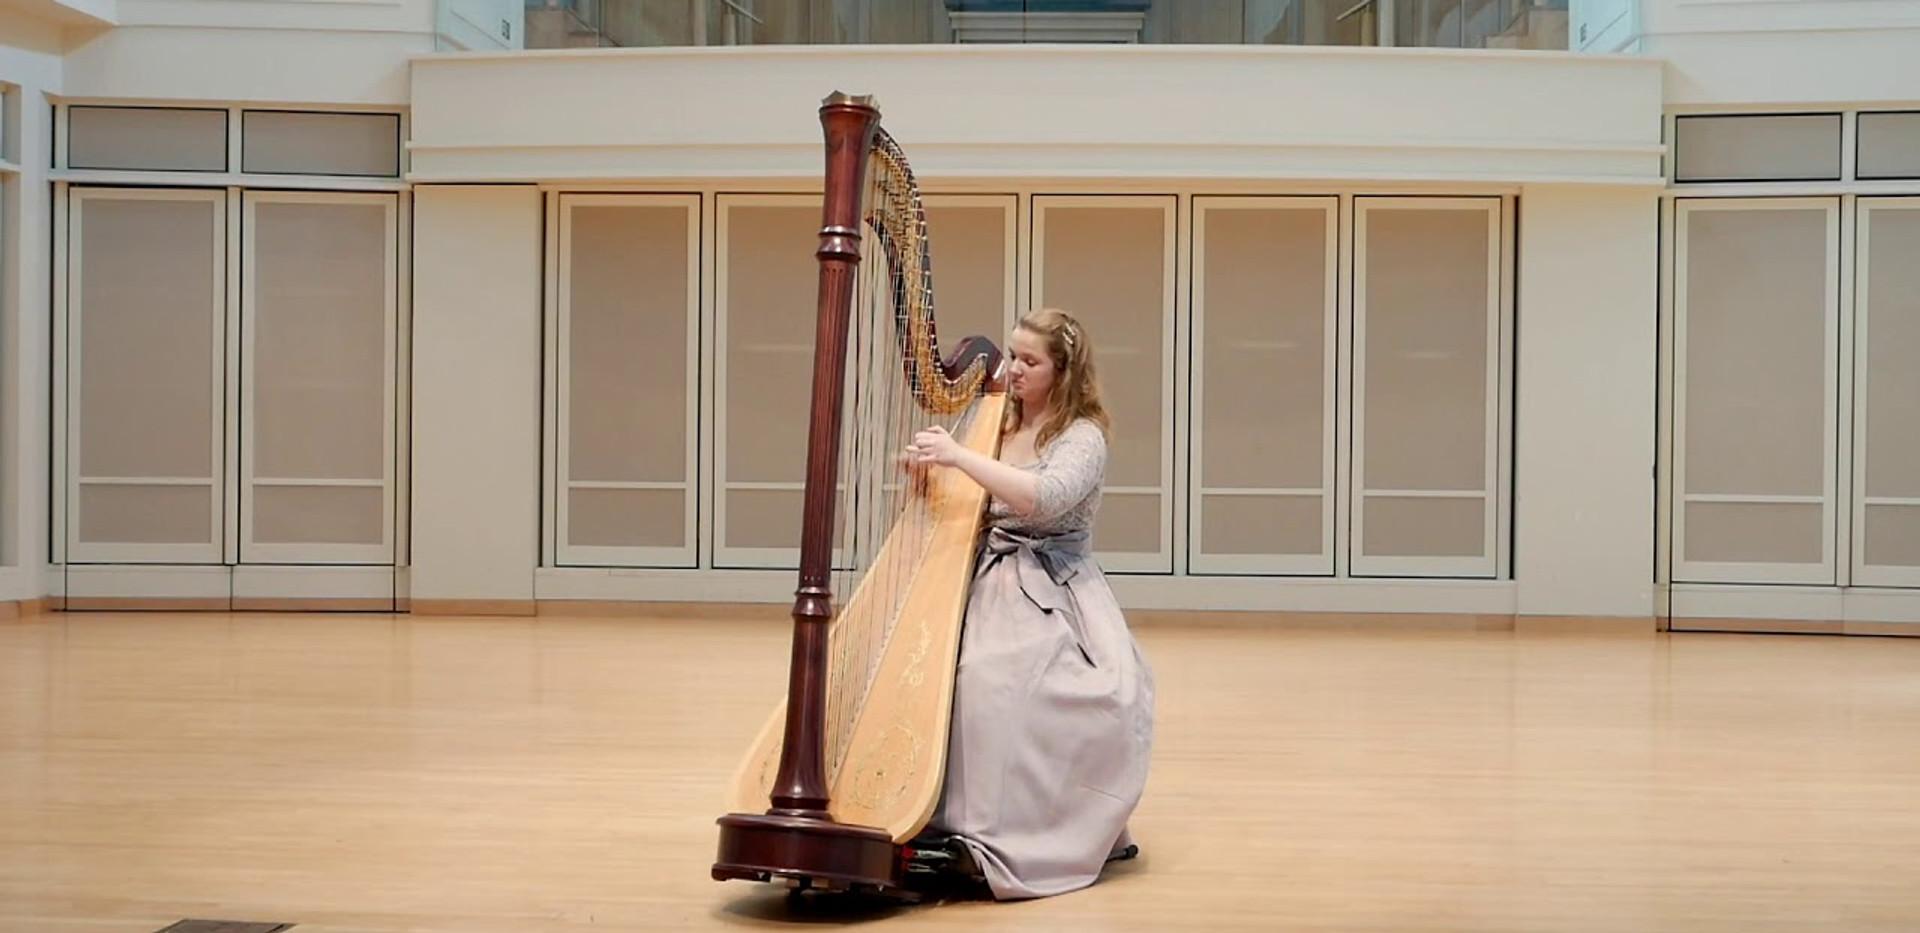 J.S. Bach: Suite in E Minor BWV 996 V. Bourrée